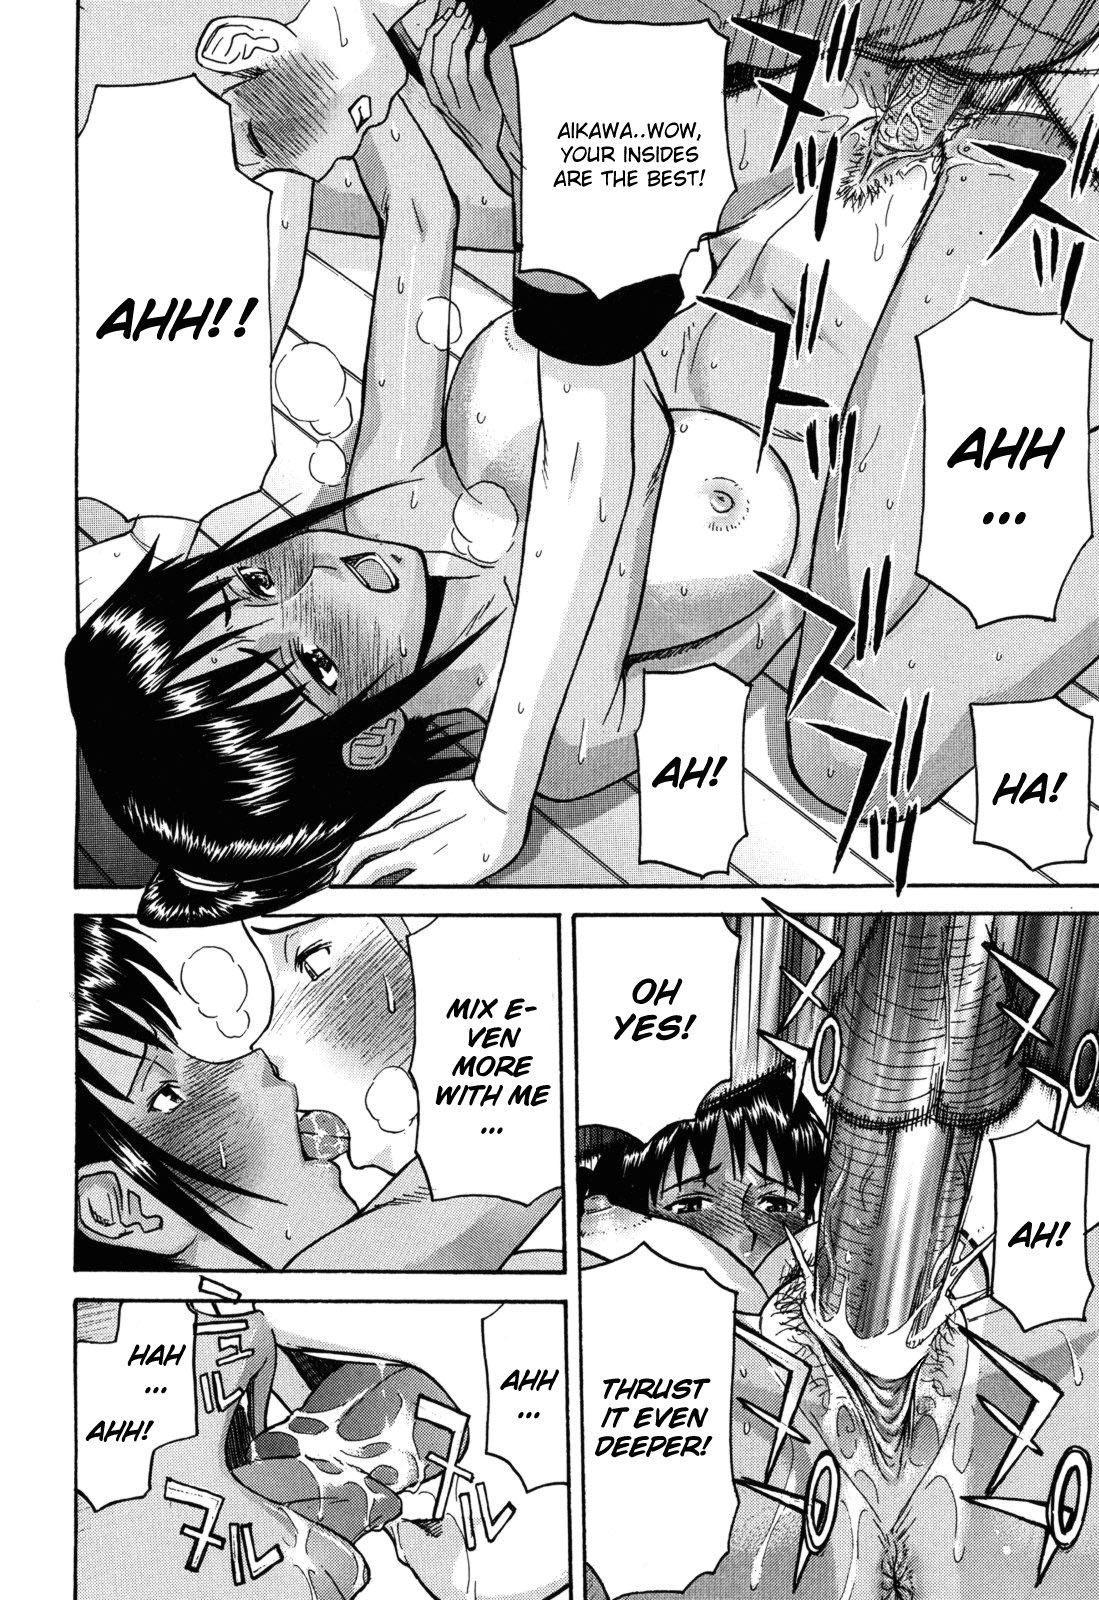 [Inomaru] 8-gatsu 31-nichi | August 31st (Camellia) [English] [CGrascal] [Decensored] 19